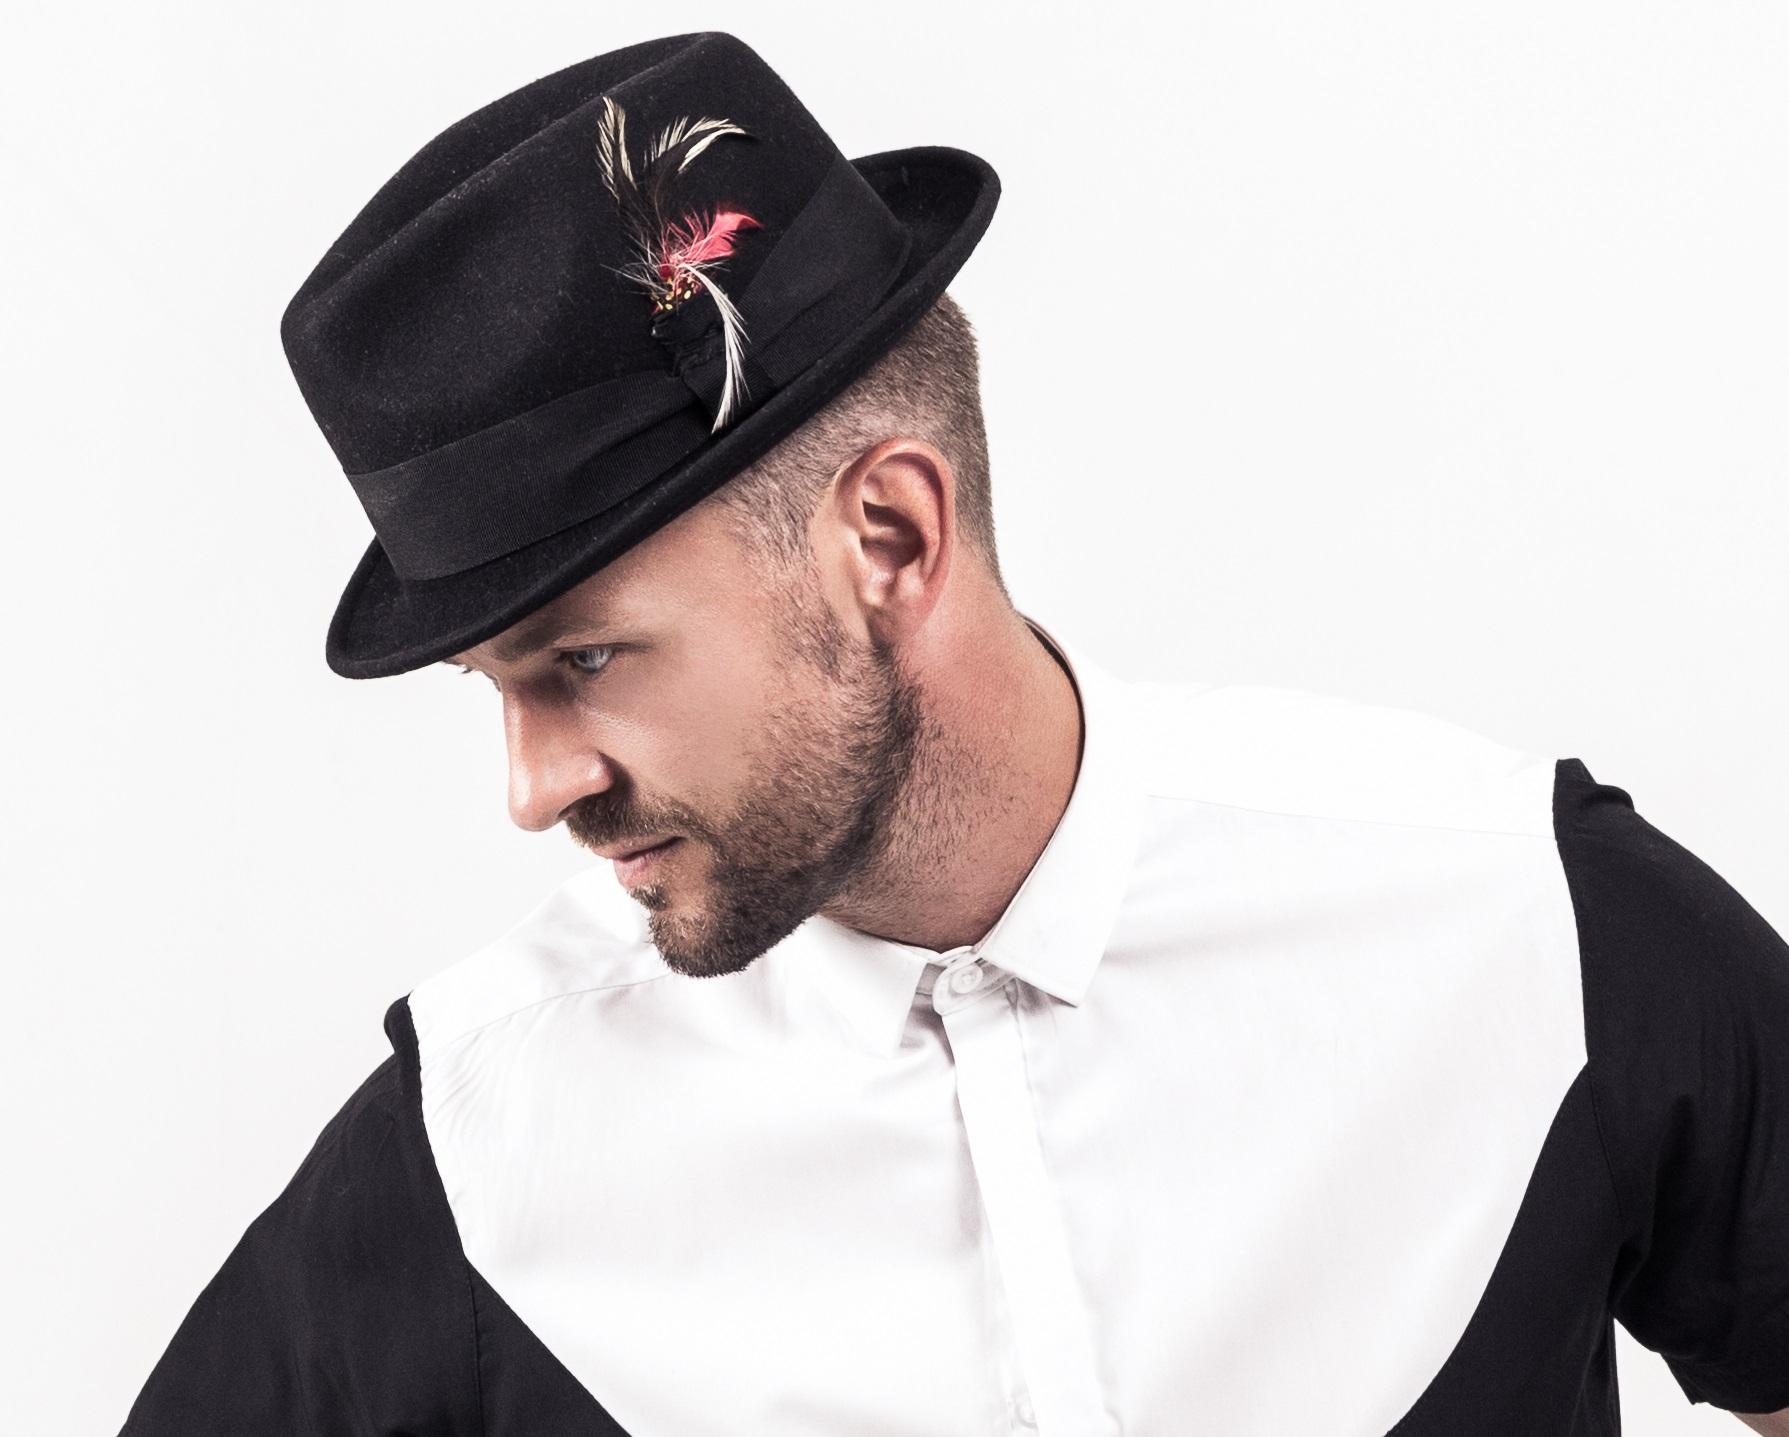 Justin Timberlake Tribute Act - Justin Timberlike